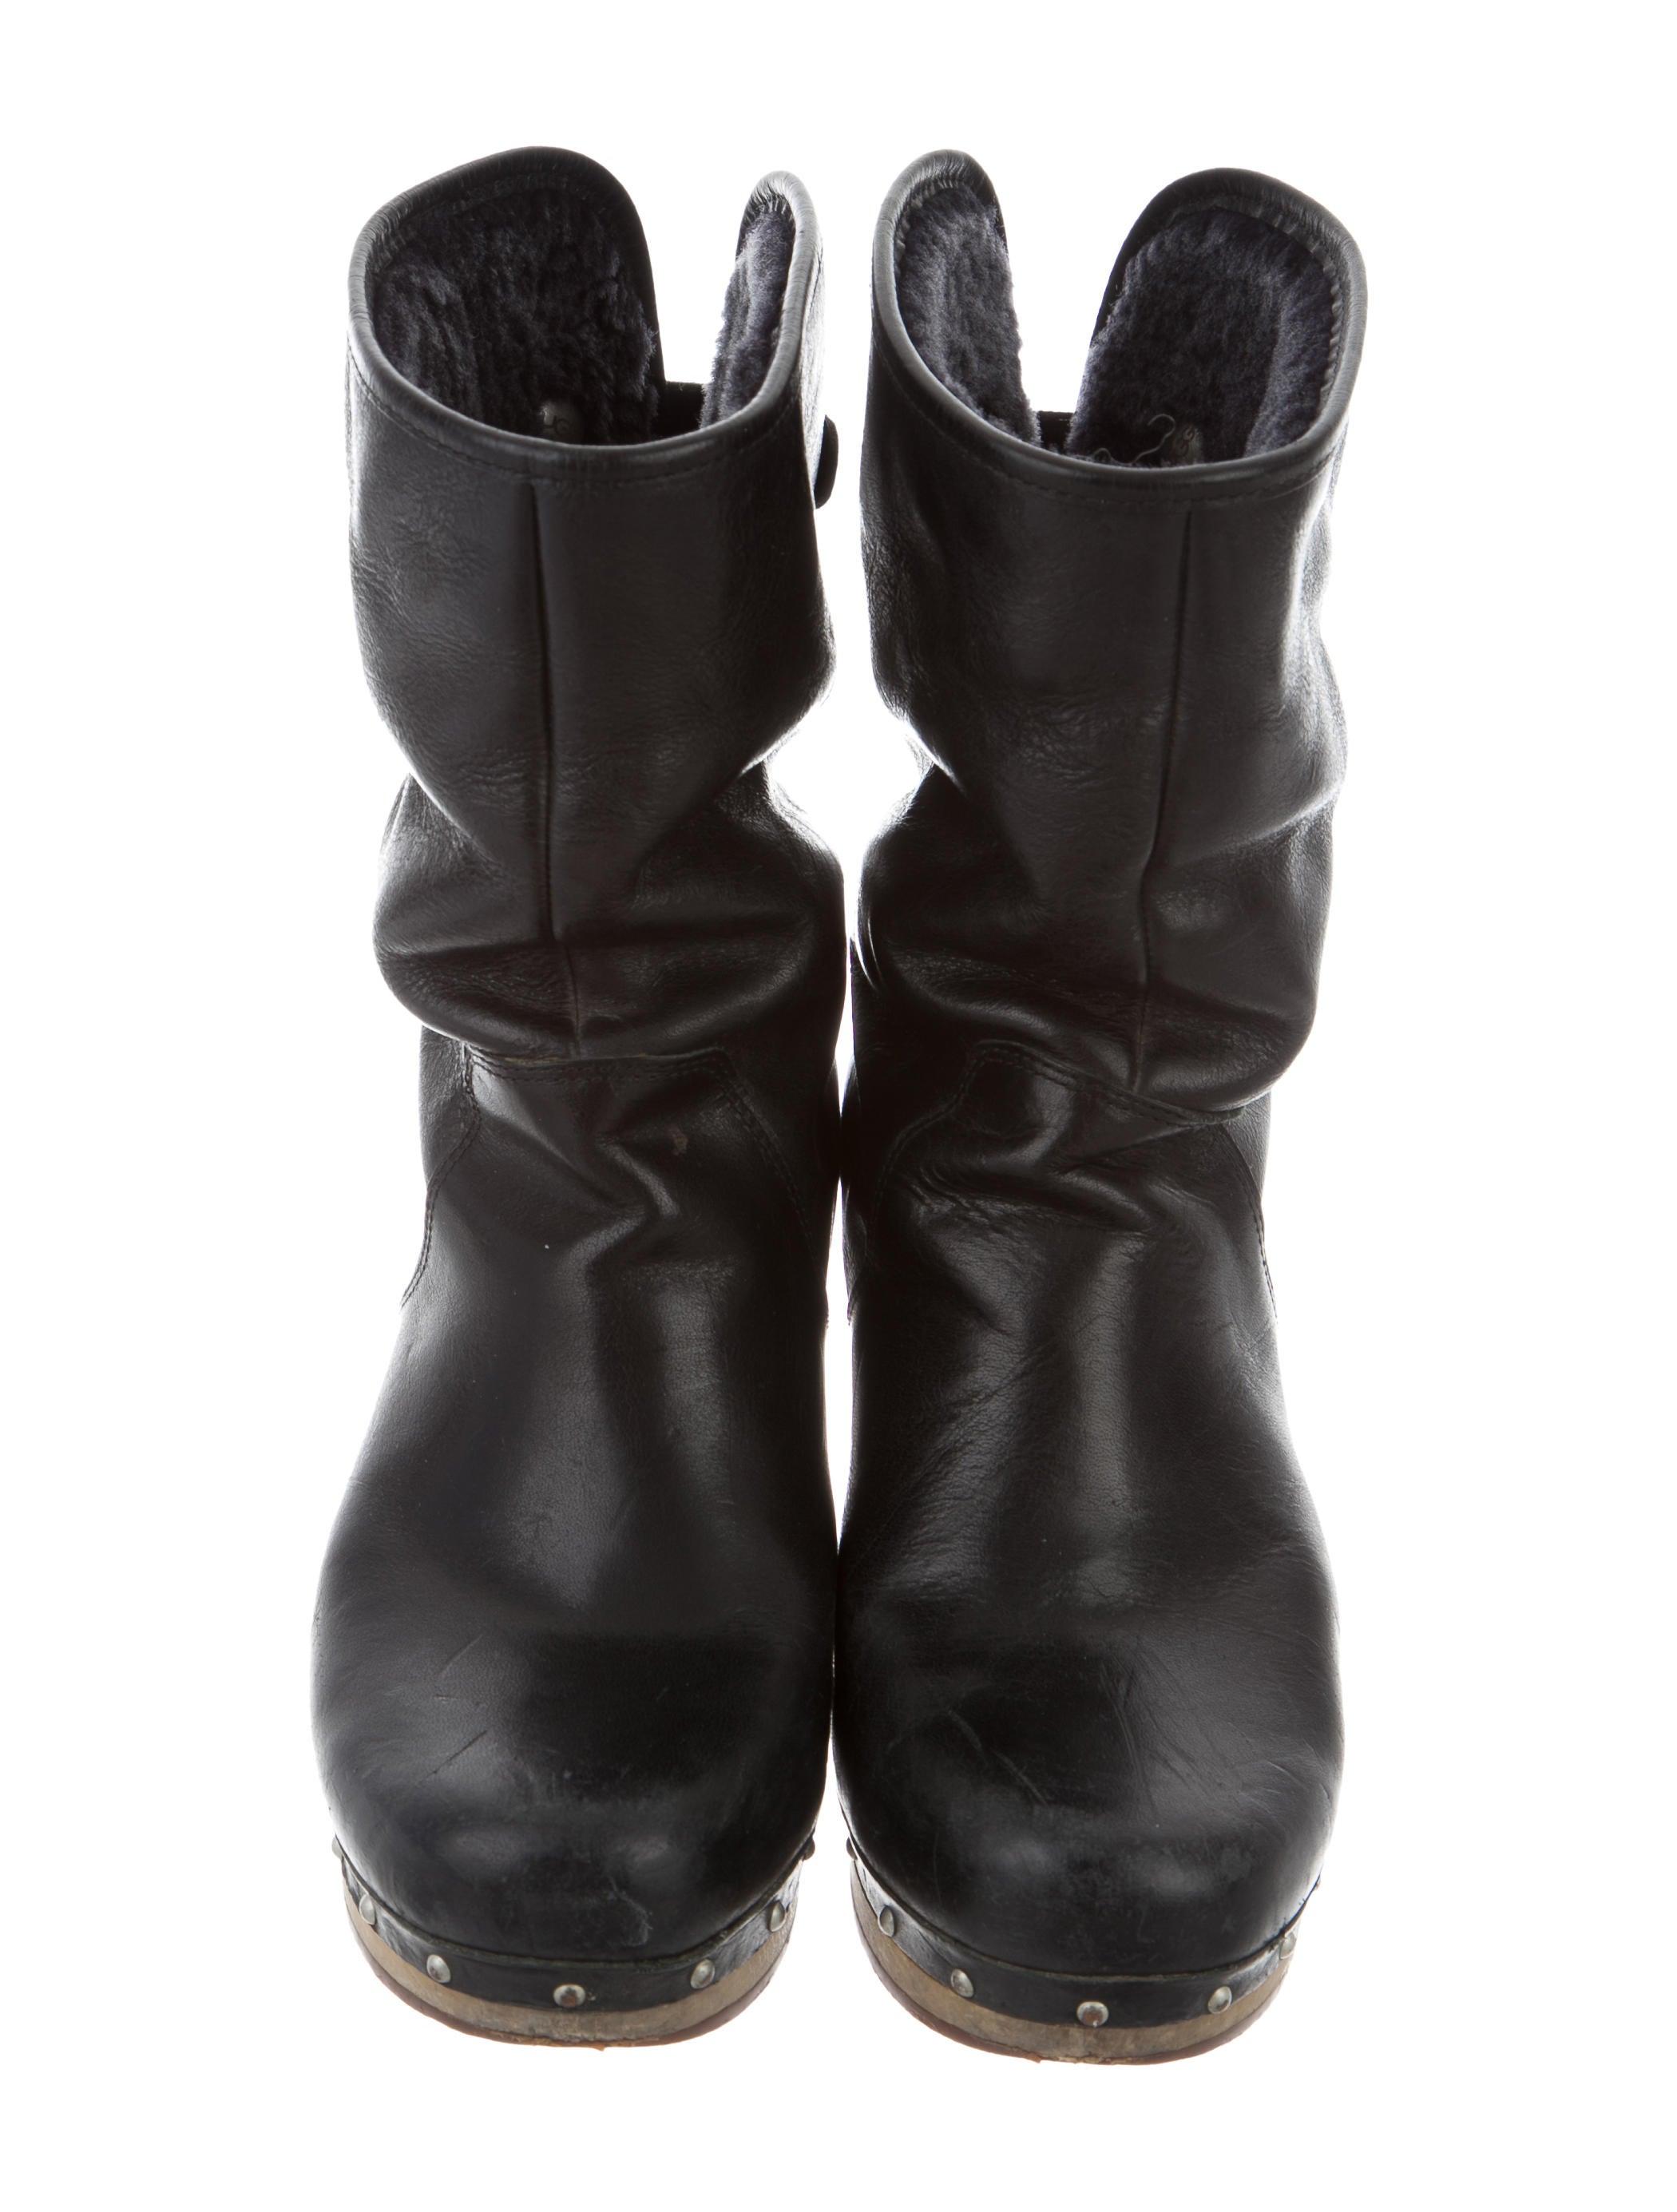 ugg lynnea boots size 6